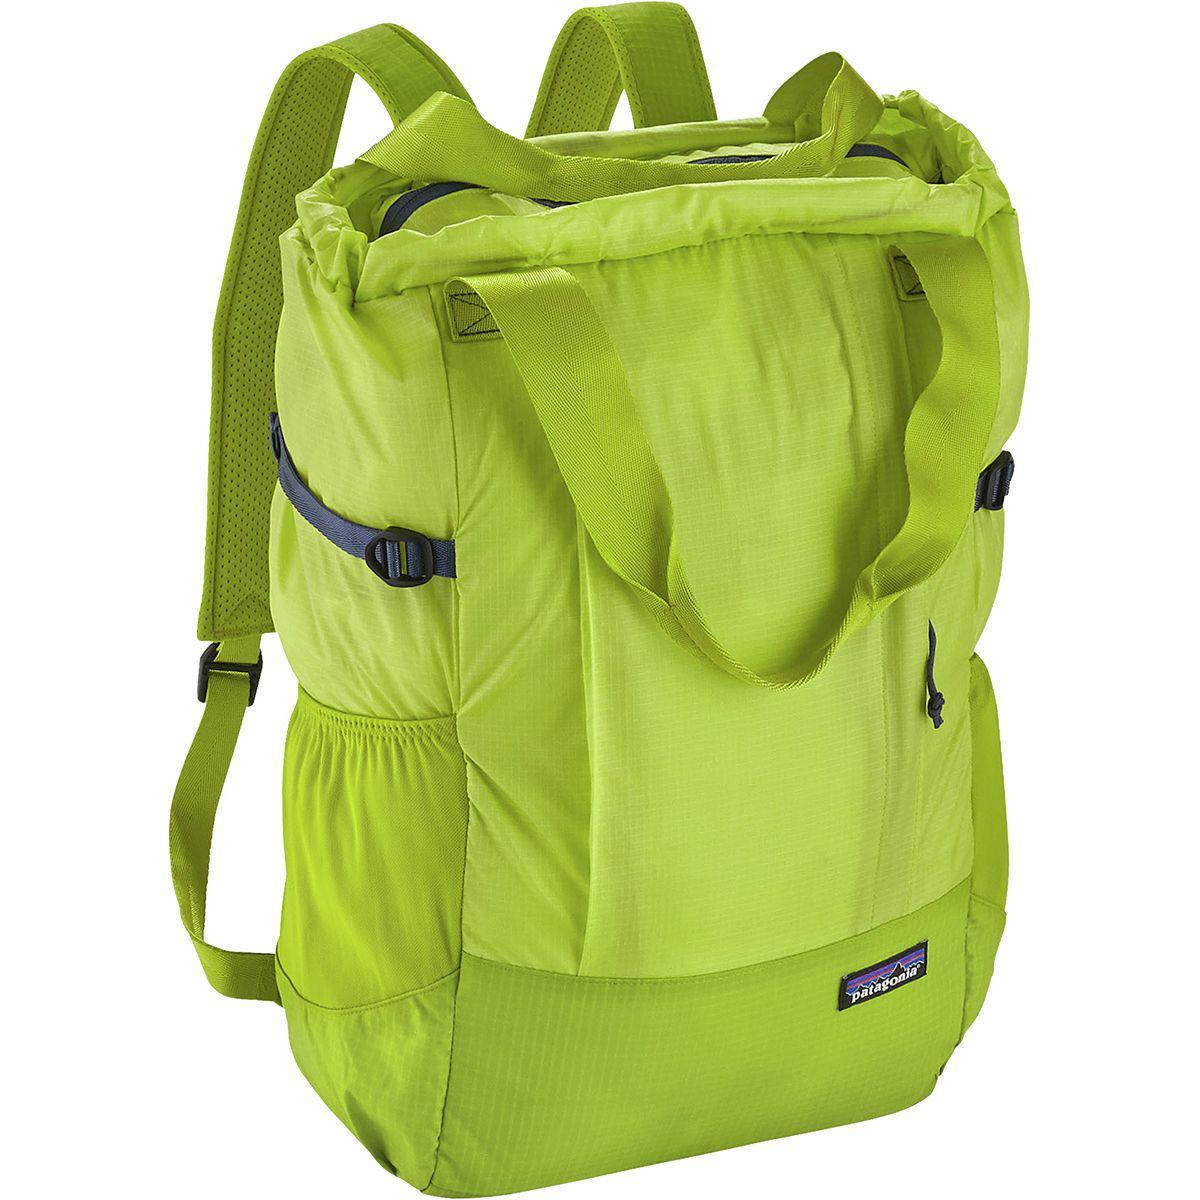 9508a52004b7 Patagonia - Green Lightweight Travel 22l Tote for Men - Lyst. View  fullscreen